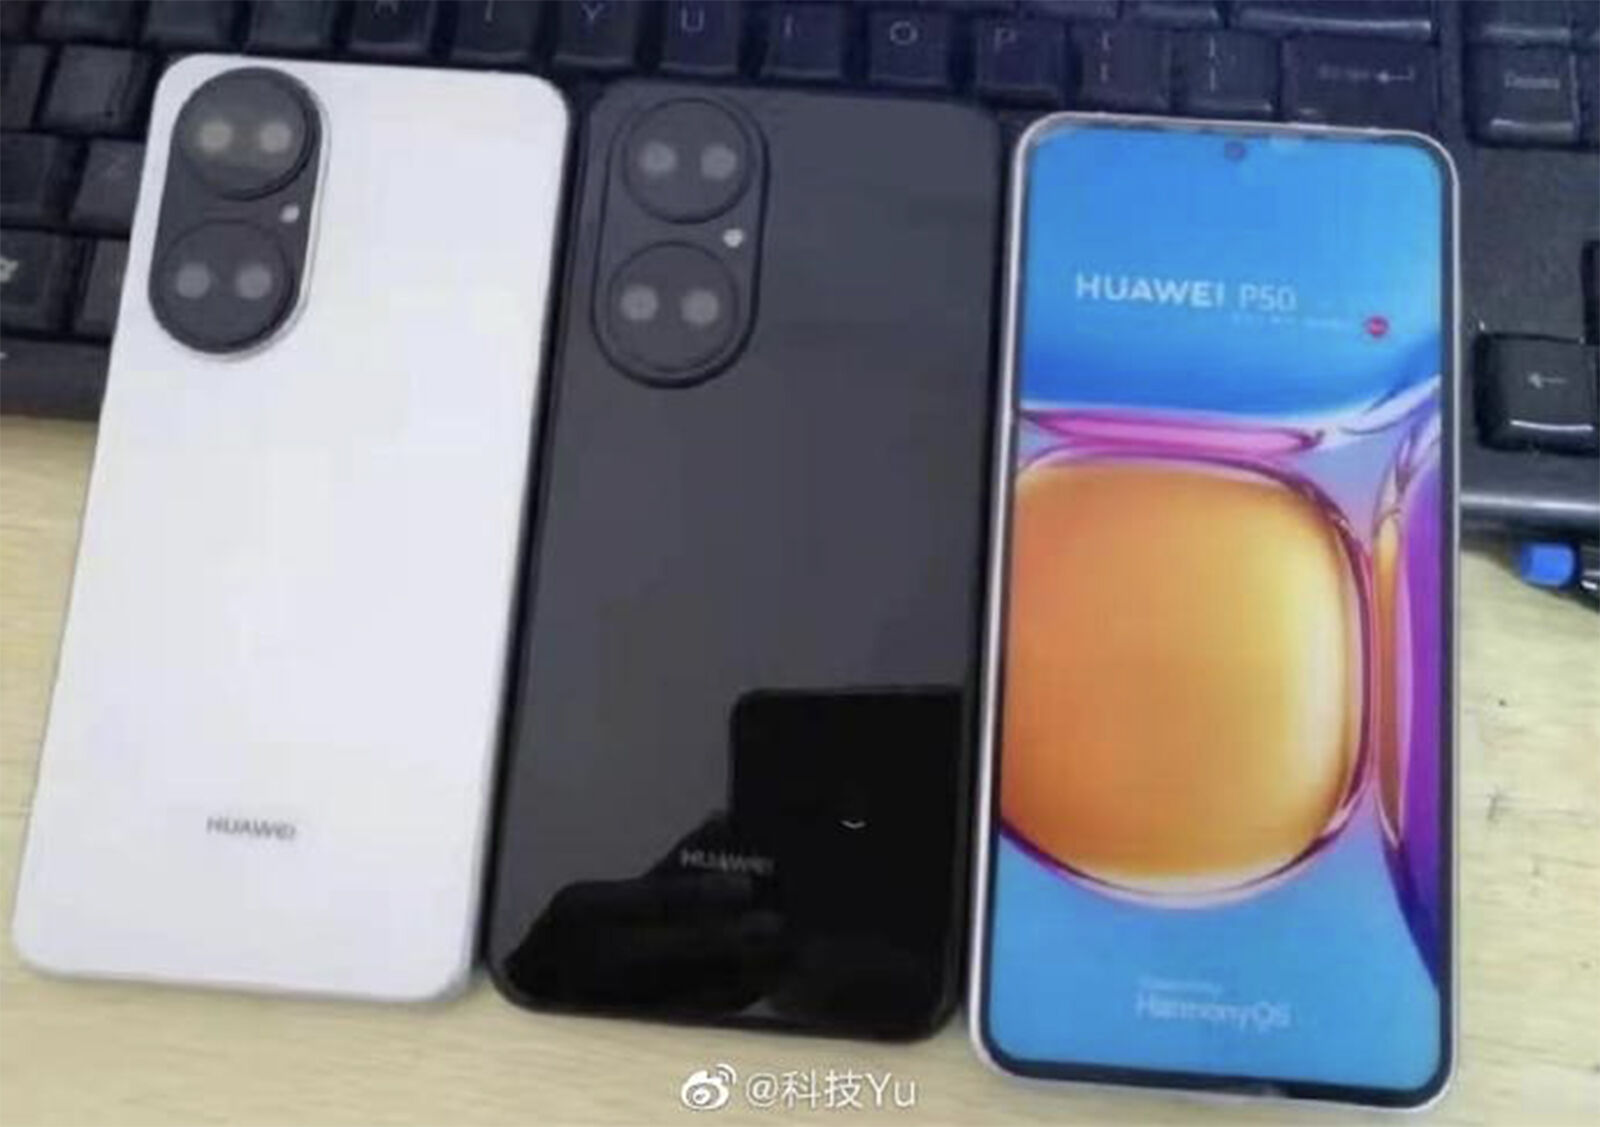 Huawei P50 spyshot | Source: Technology Yu via Weibo